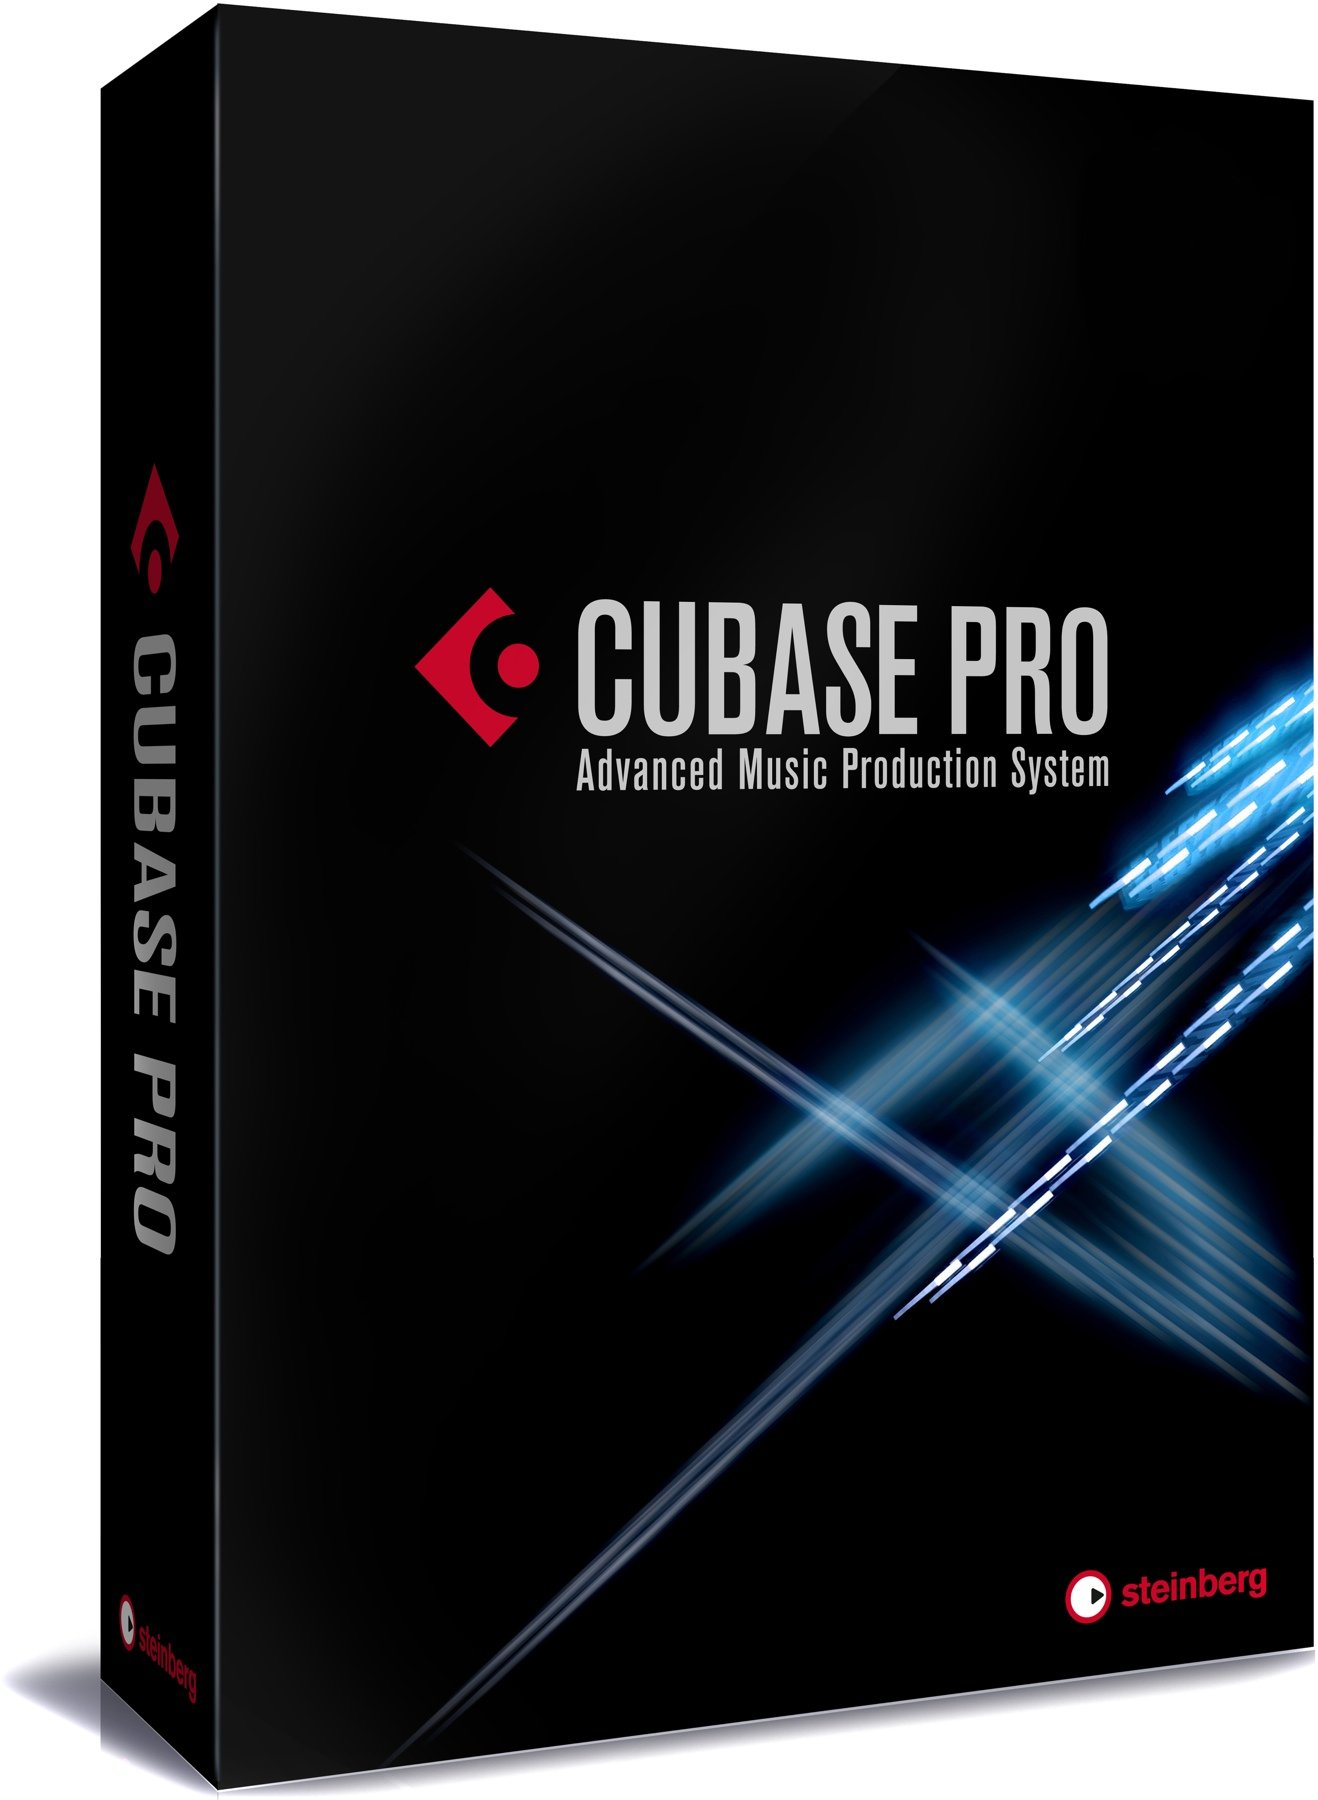 steinberg cubase pro 9 petitive crossgrade